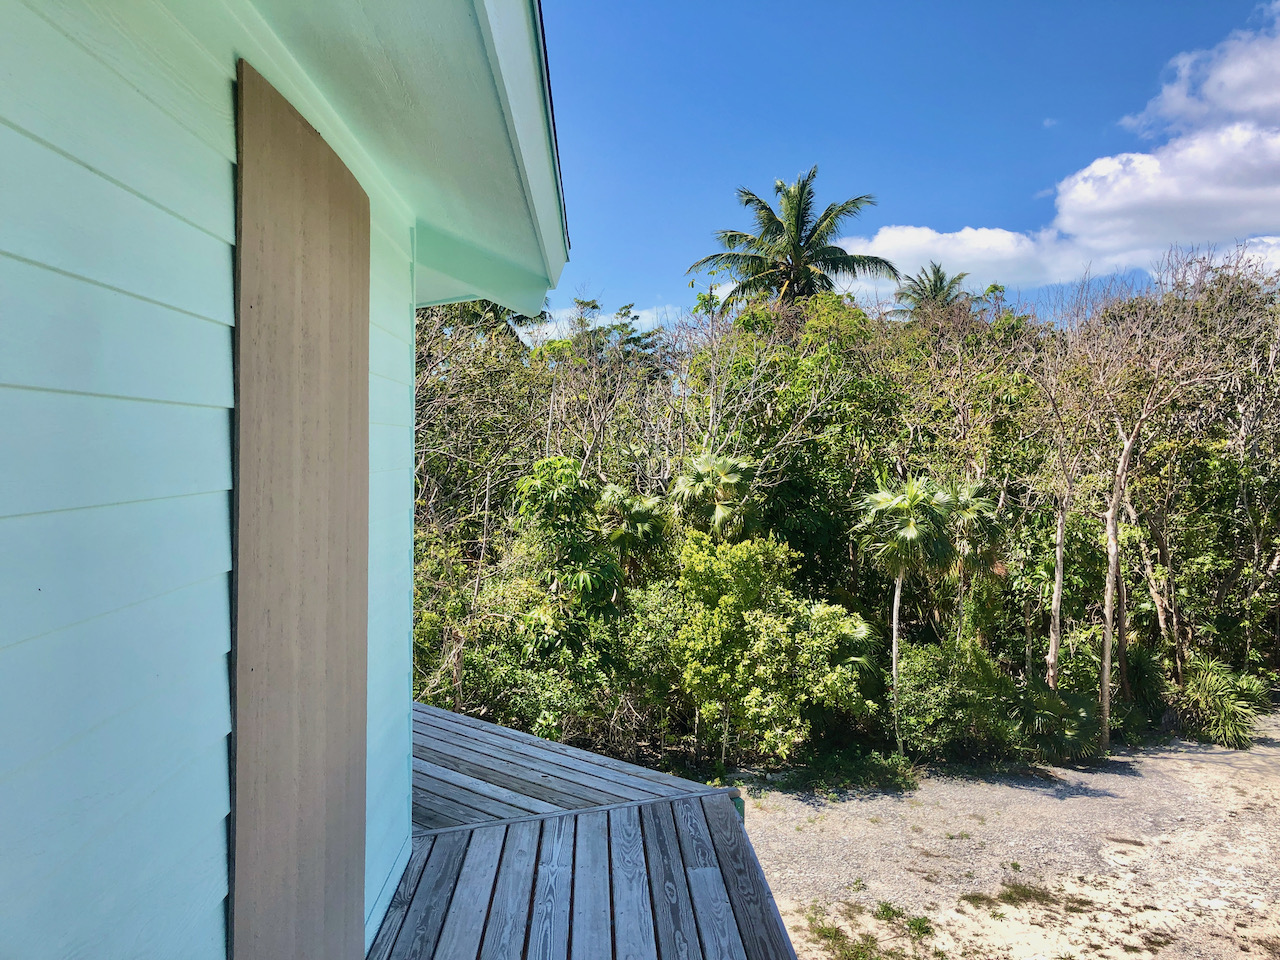 bahama-palm-shores-beachfront-home-for-sale-8